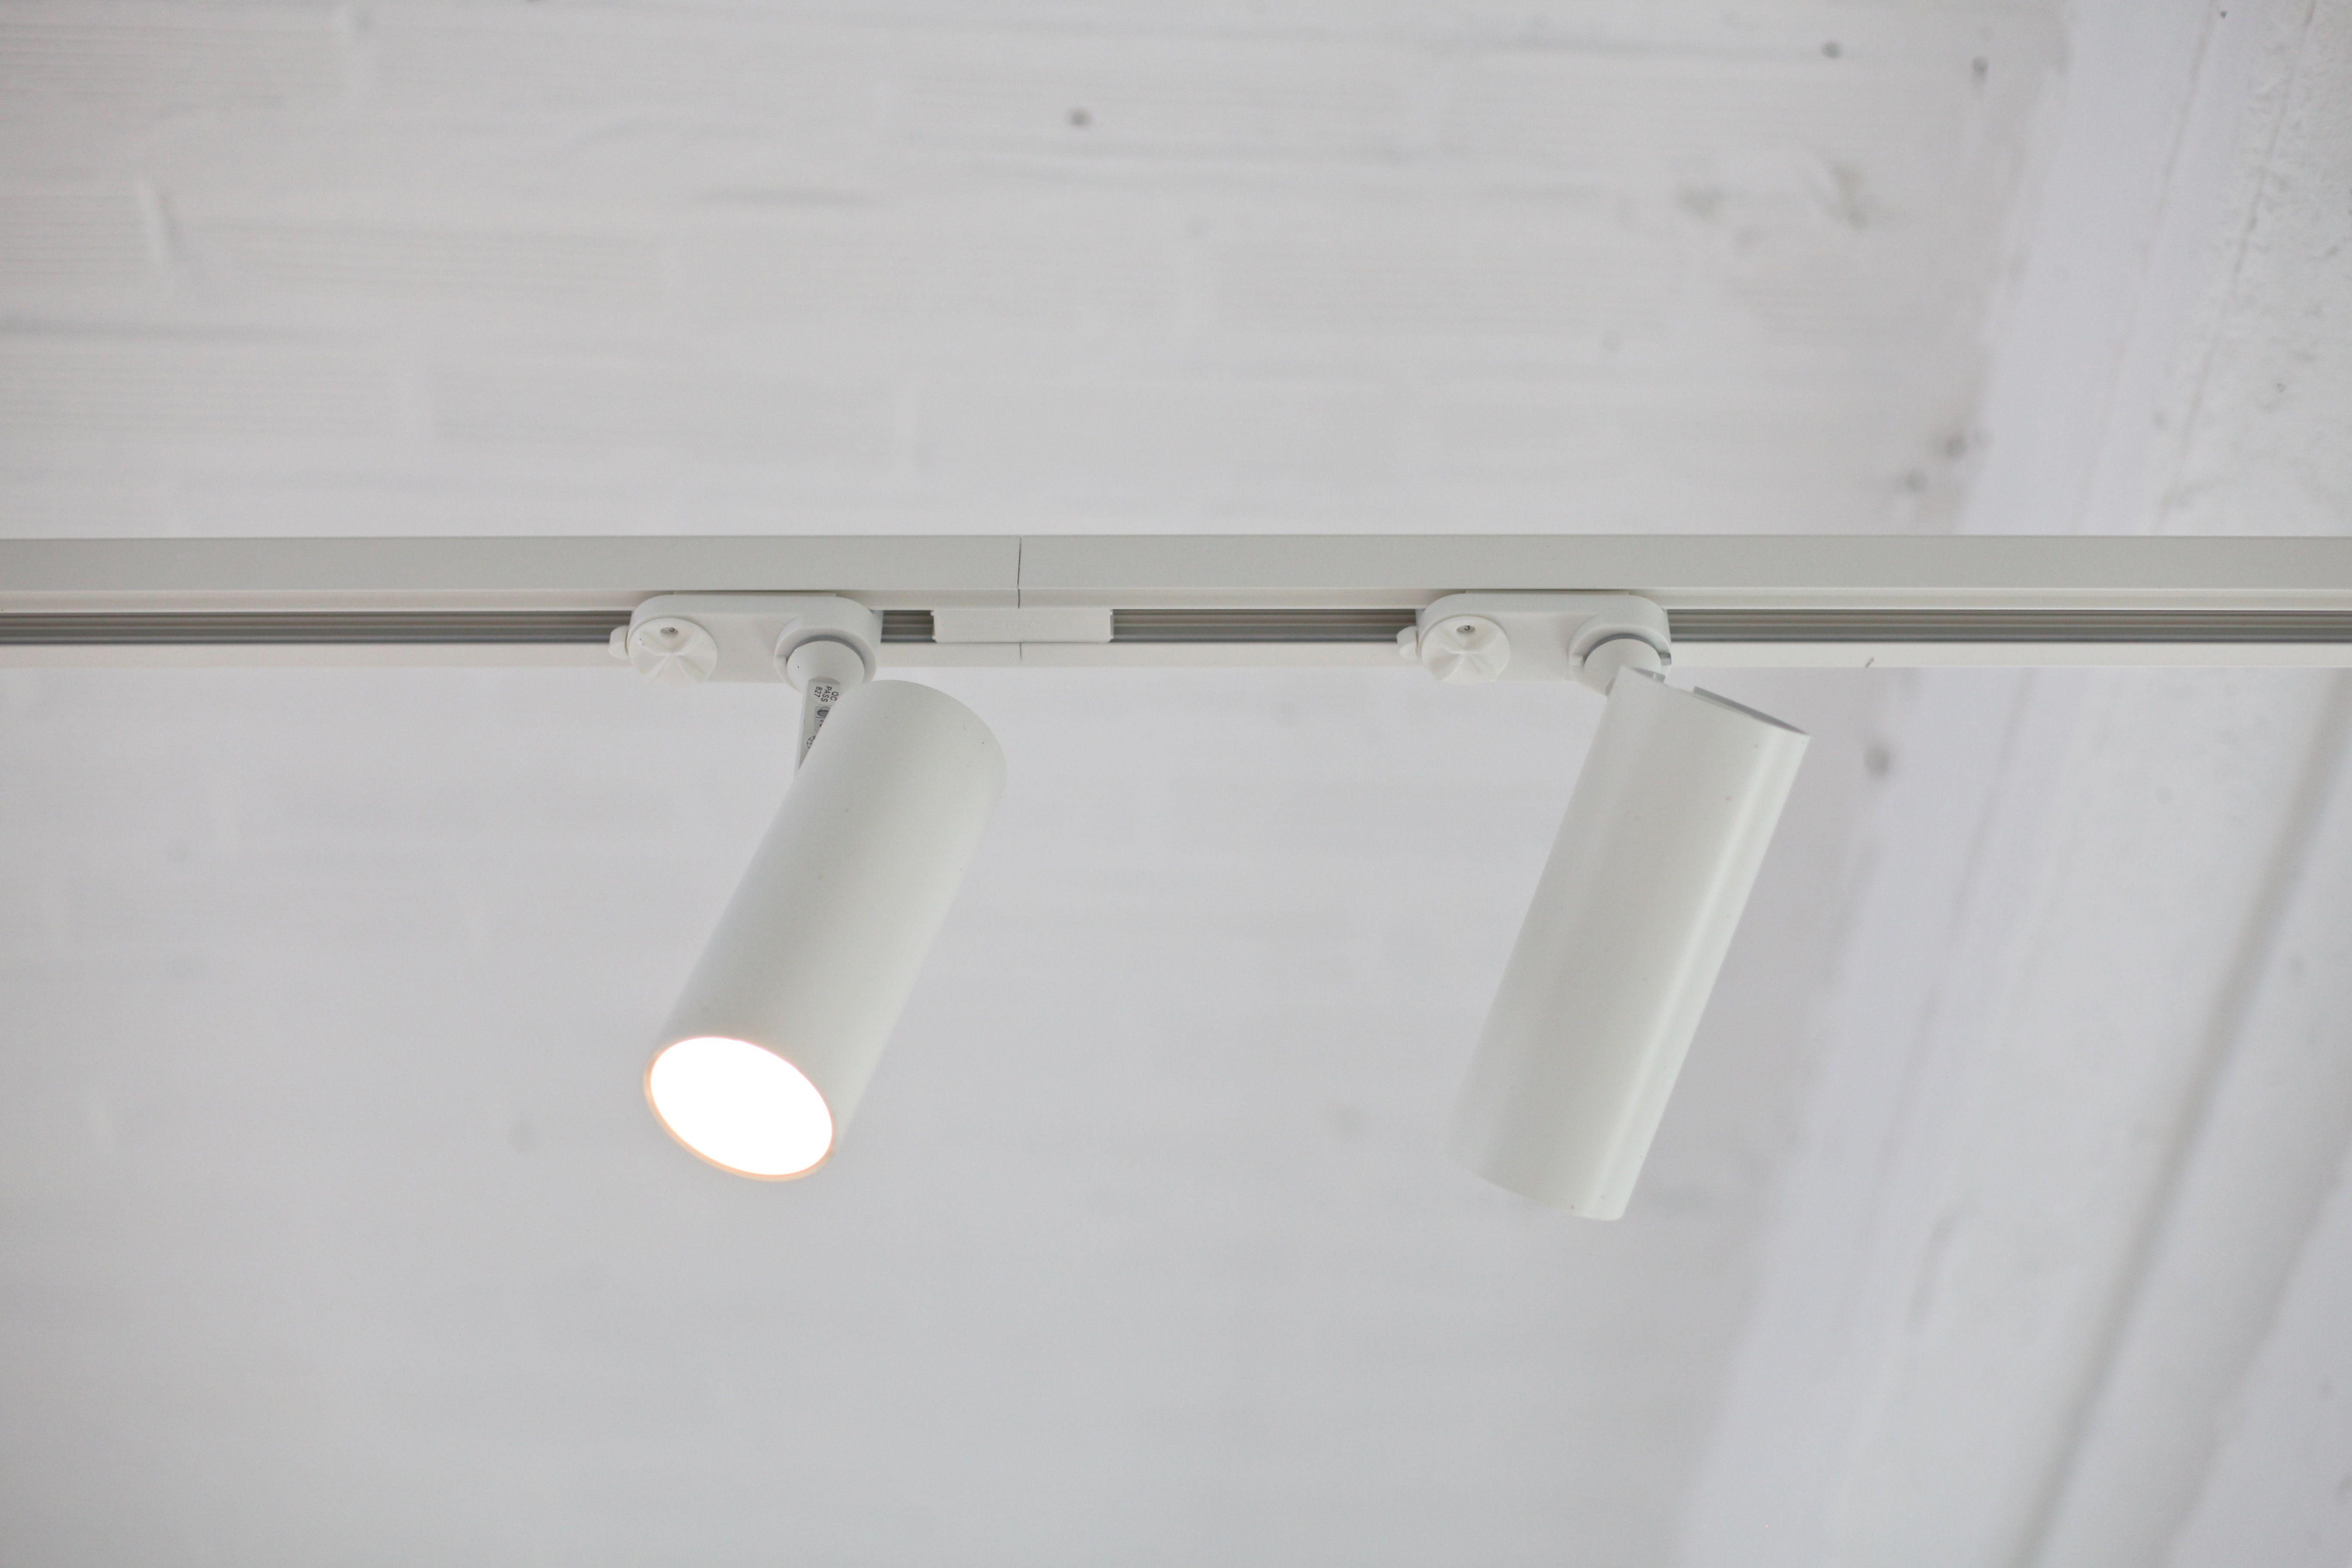 tuki dark lighting tuki tukiontrack track white led dark darlings design dark be retail lighting led light design track lighting fixtures